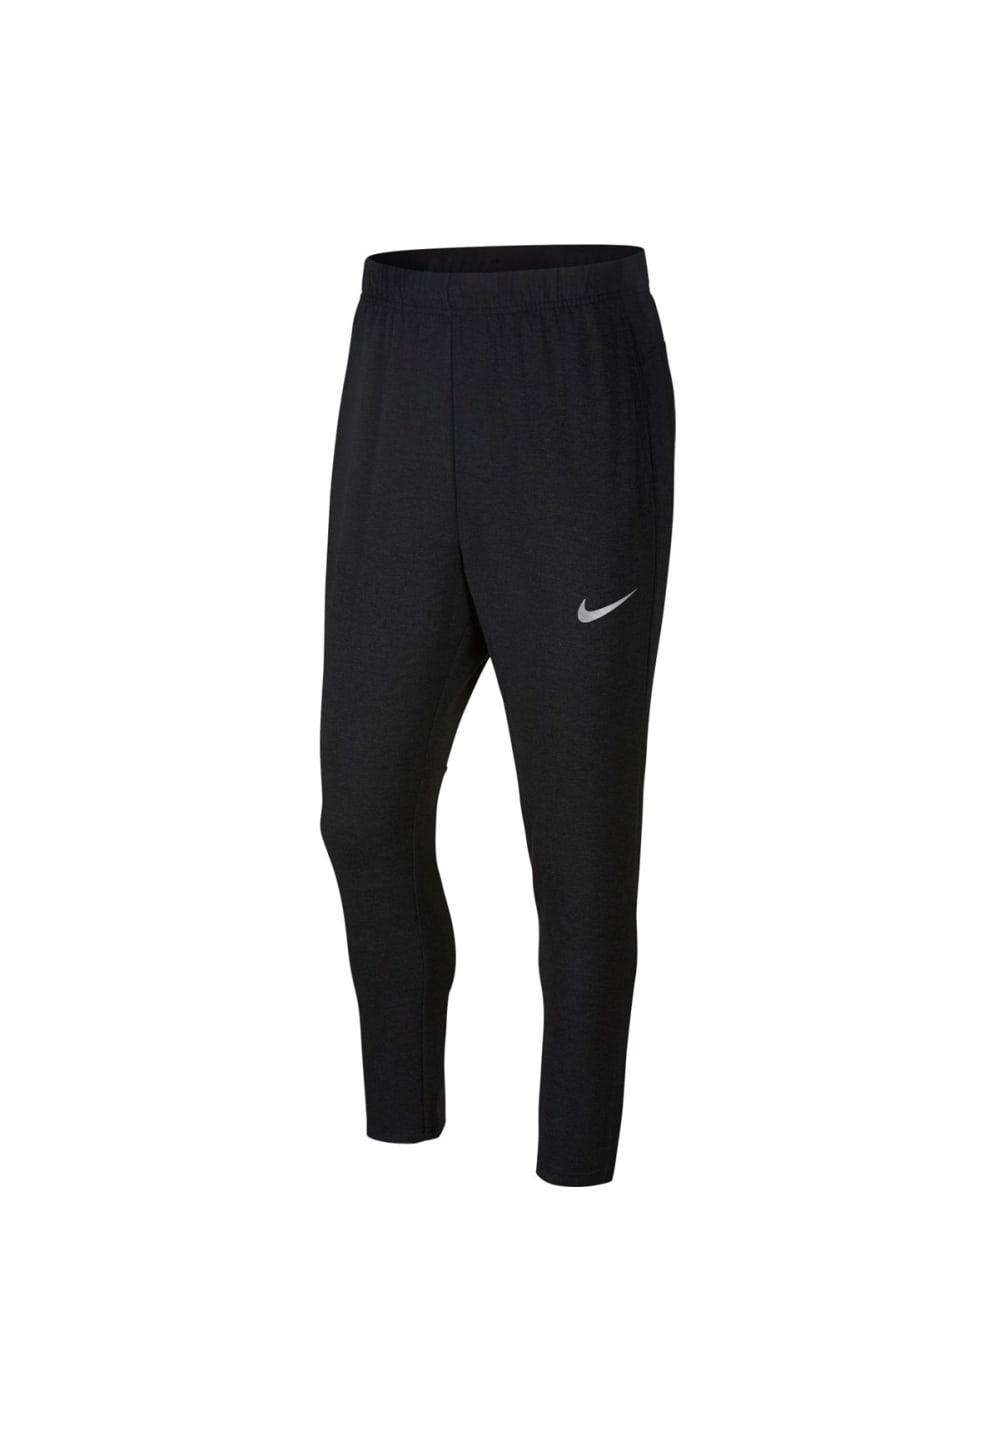 Nike Dry Pant Tpr Hyperdry Lt - Fitnesshosen für Herren - Schwarz